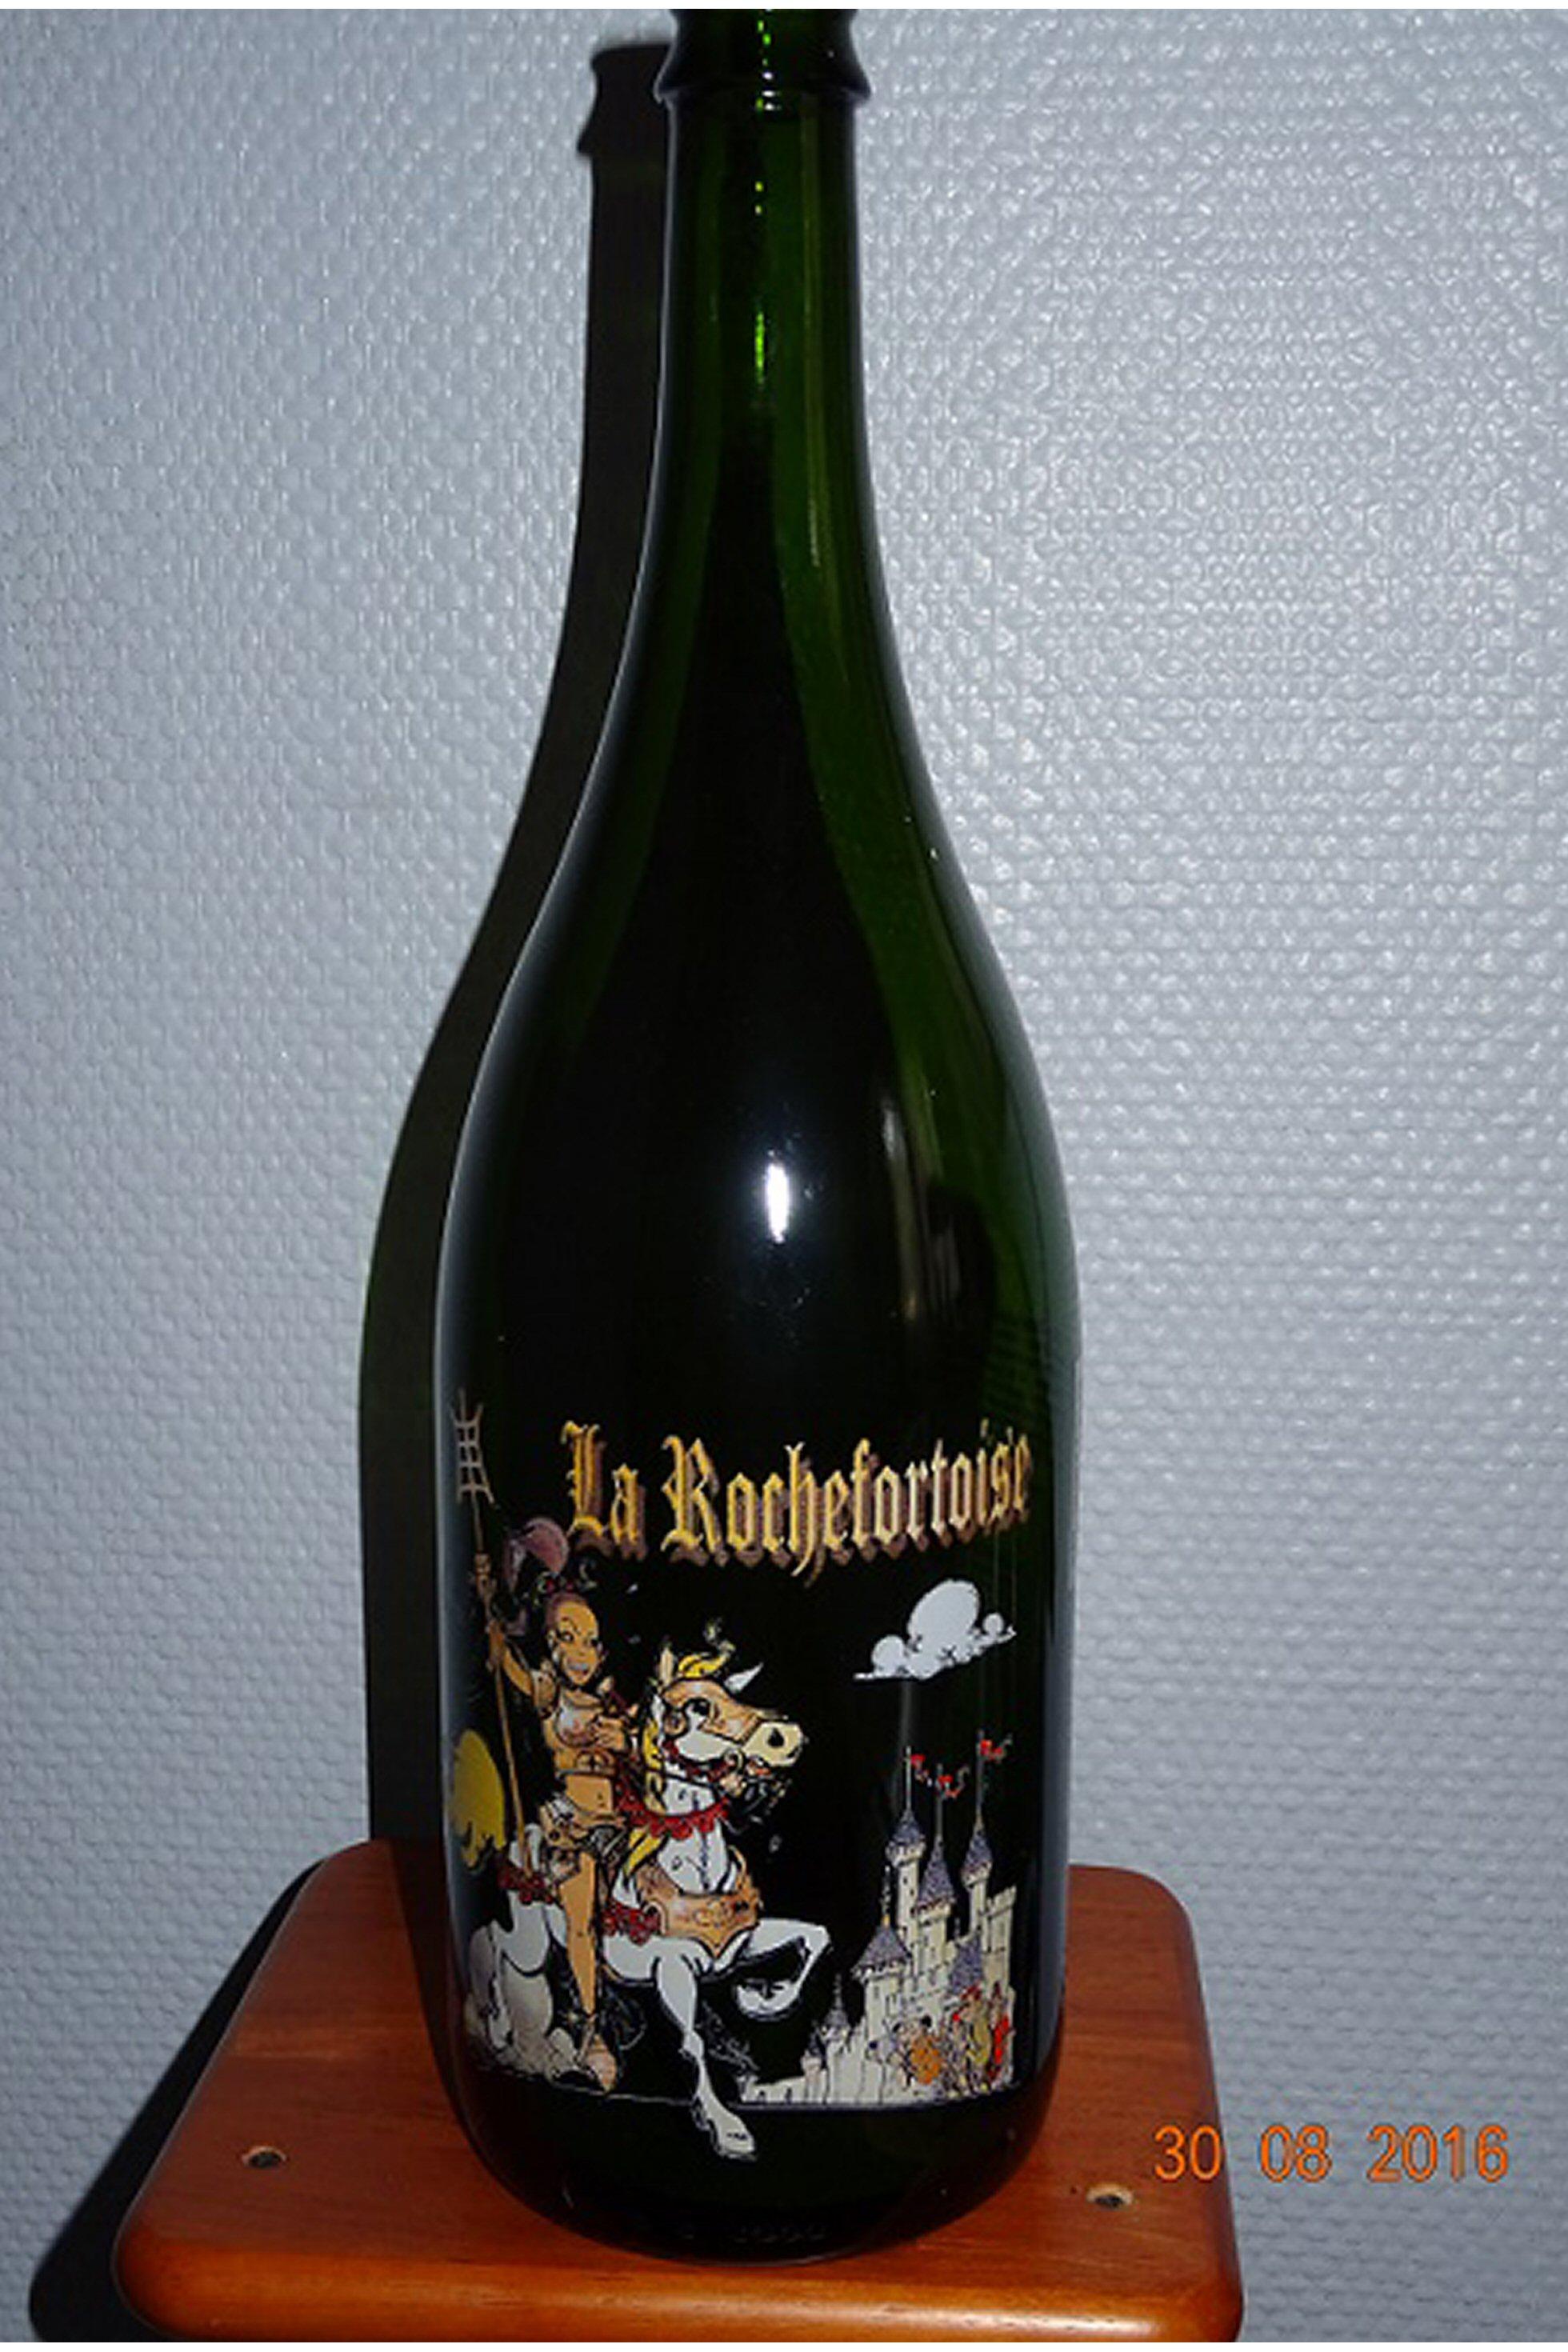 LA ROCHEFORTOISE 1996 1.5L ABC .jpg